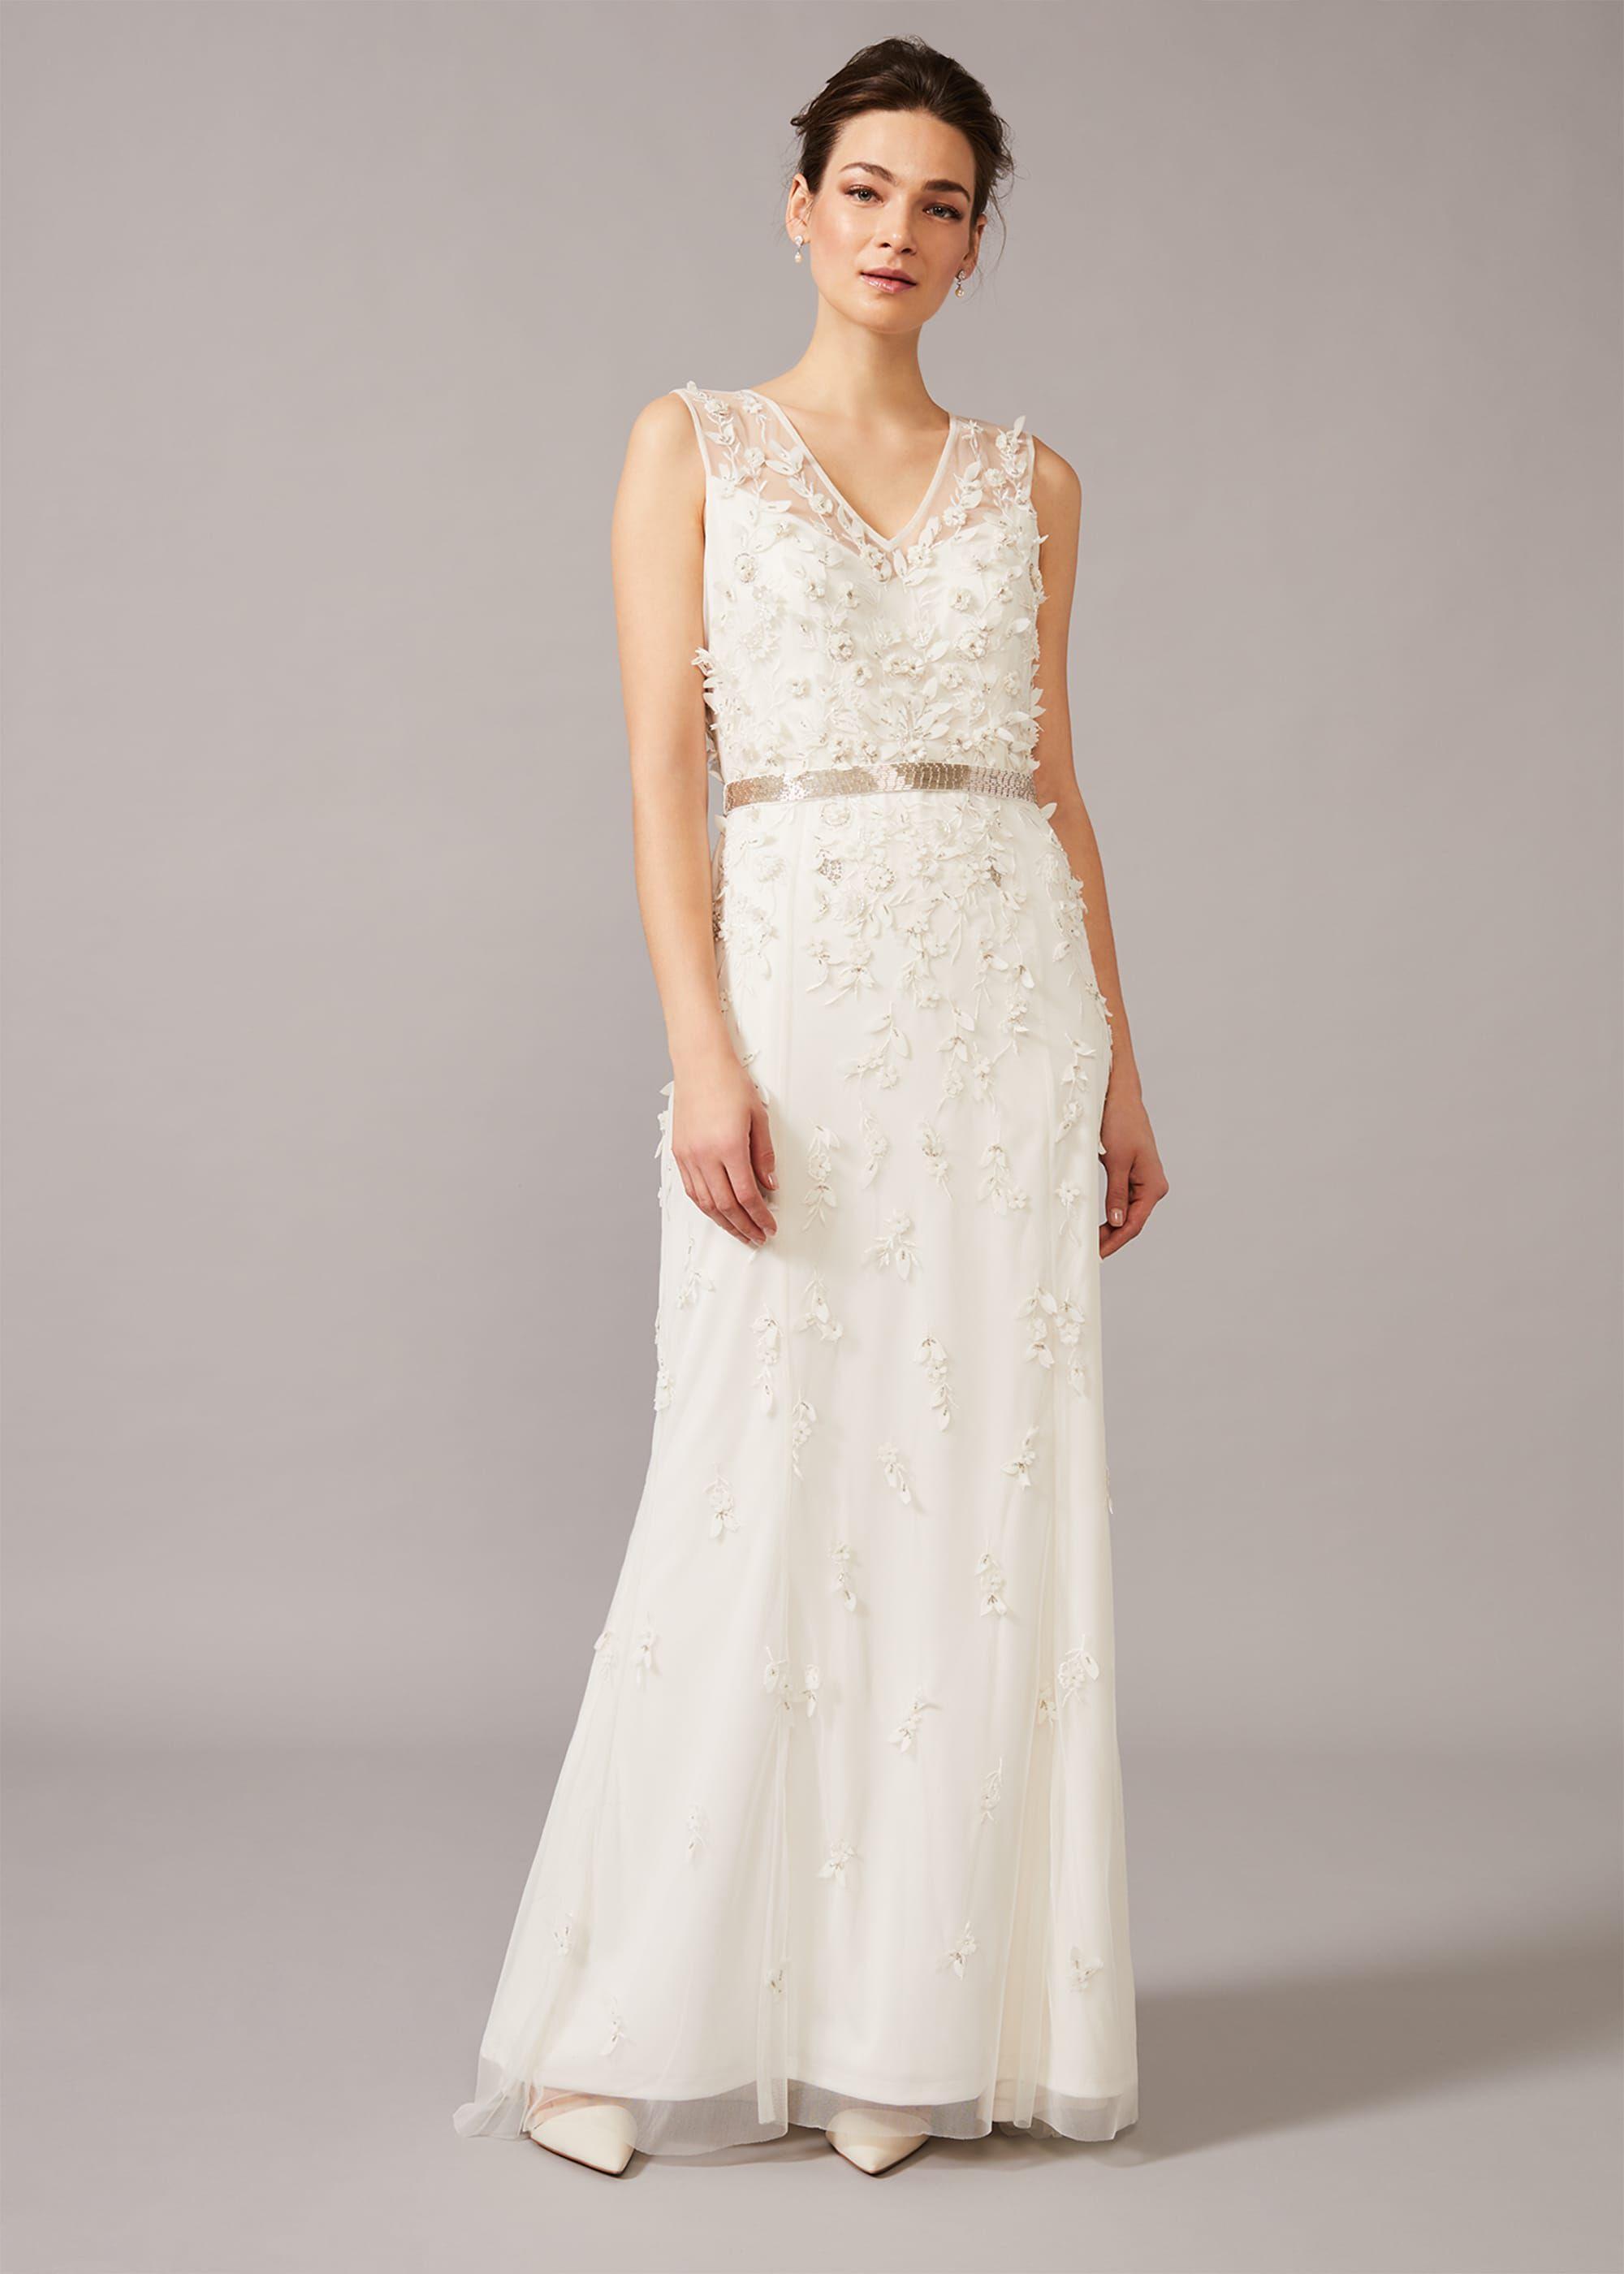 Frida Floral Applique Wedding Dress